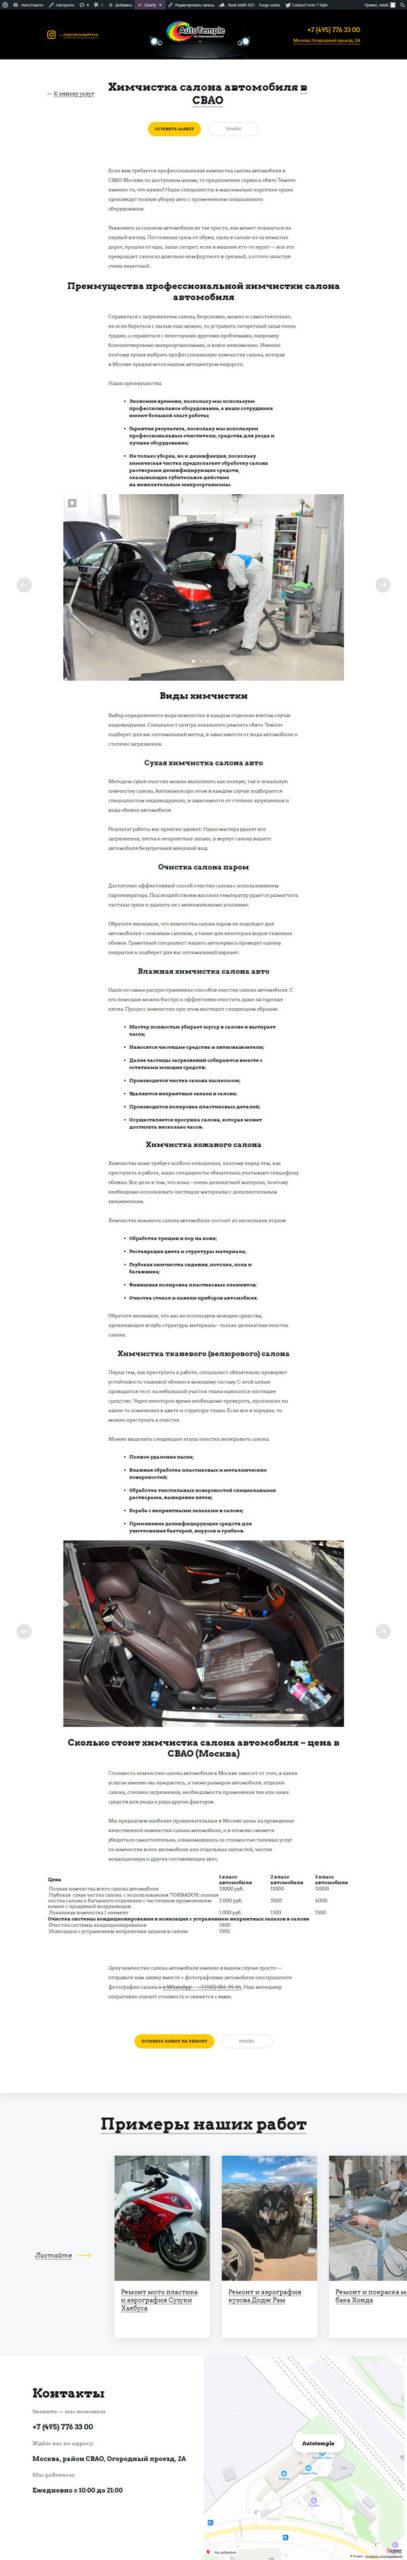 Страница услуги - Химчистка салона до изменения